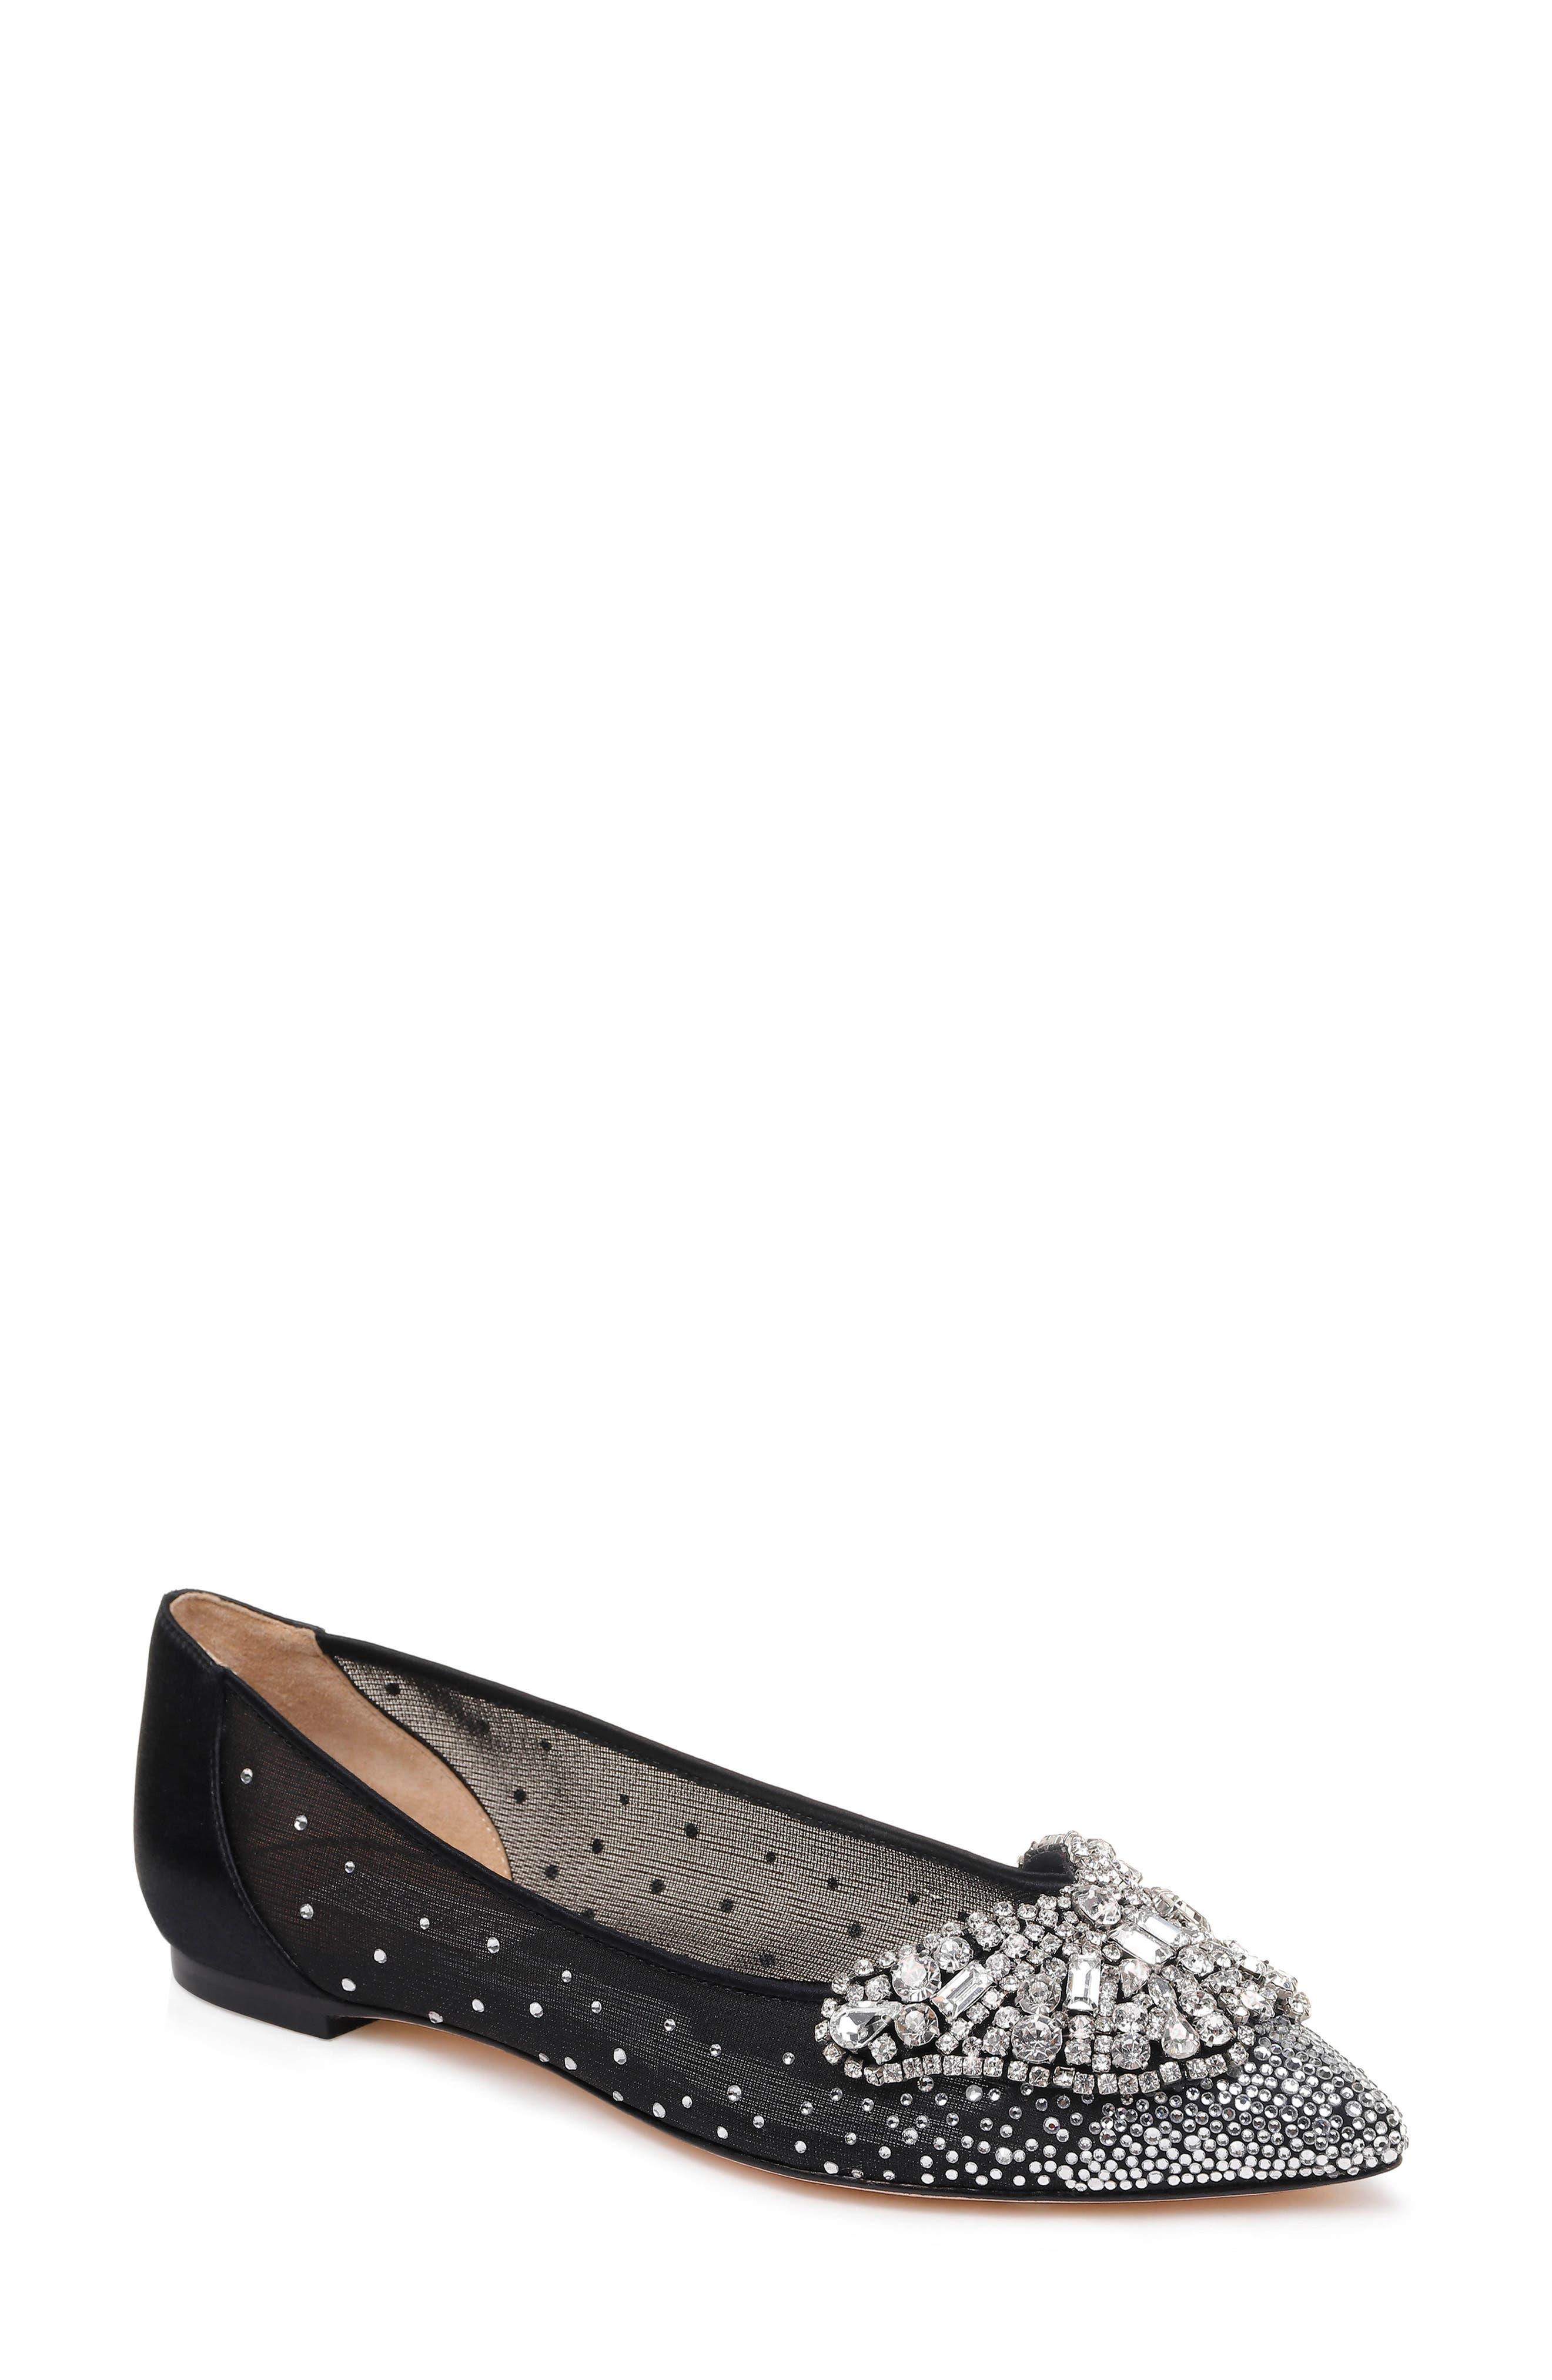 BADGLEY MISCHKA Women'S Quinn Crystal Embellished Pointed Toe Flats in Black Satin/ Mesh